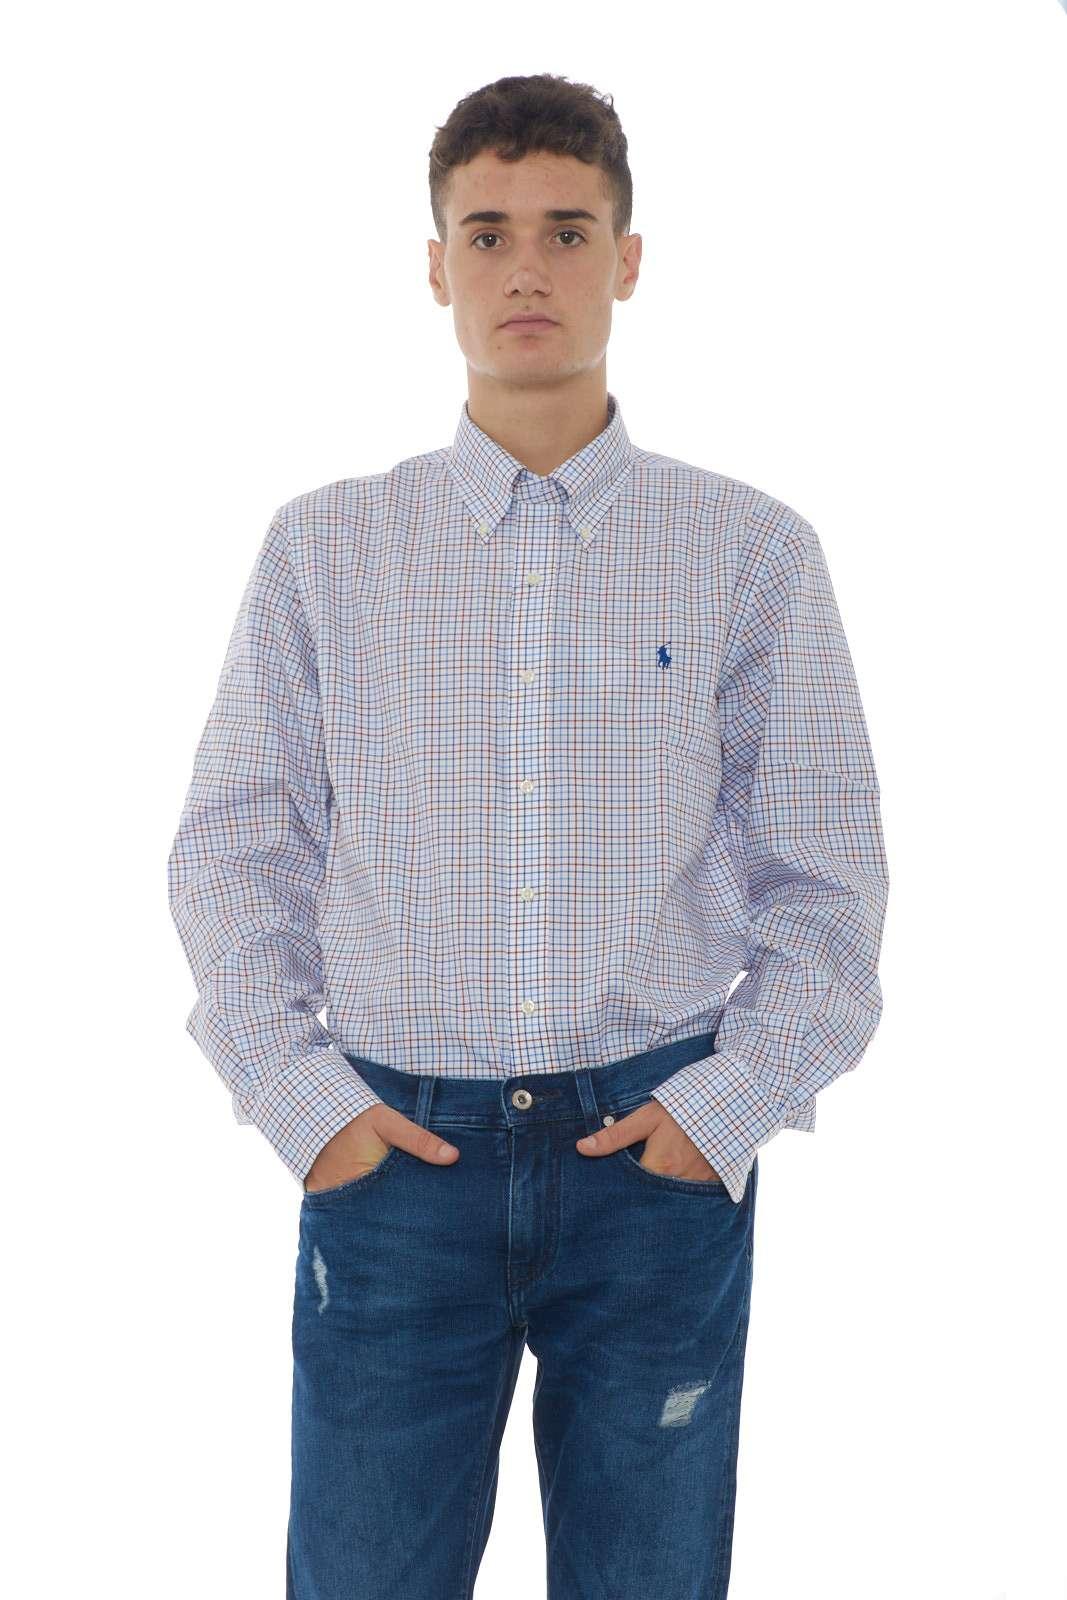 https://www.parmax.com/media/catalog/product/a/i/AI-outlet_parmax-camicia-uomo_Ralph-Lauren-712766318005-A.jpg